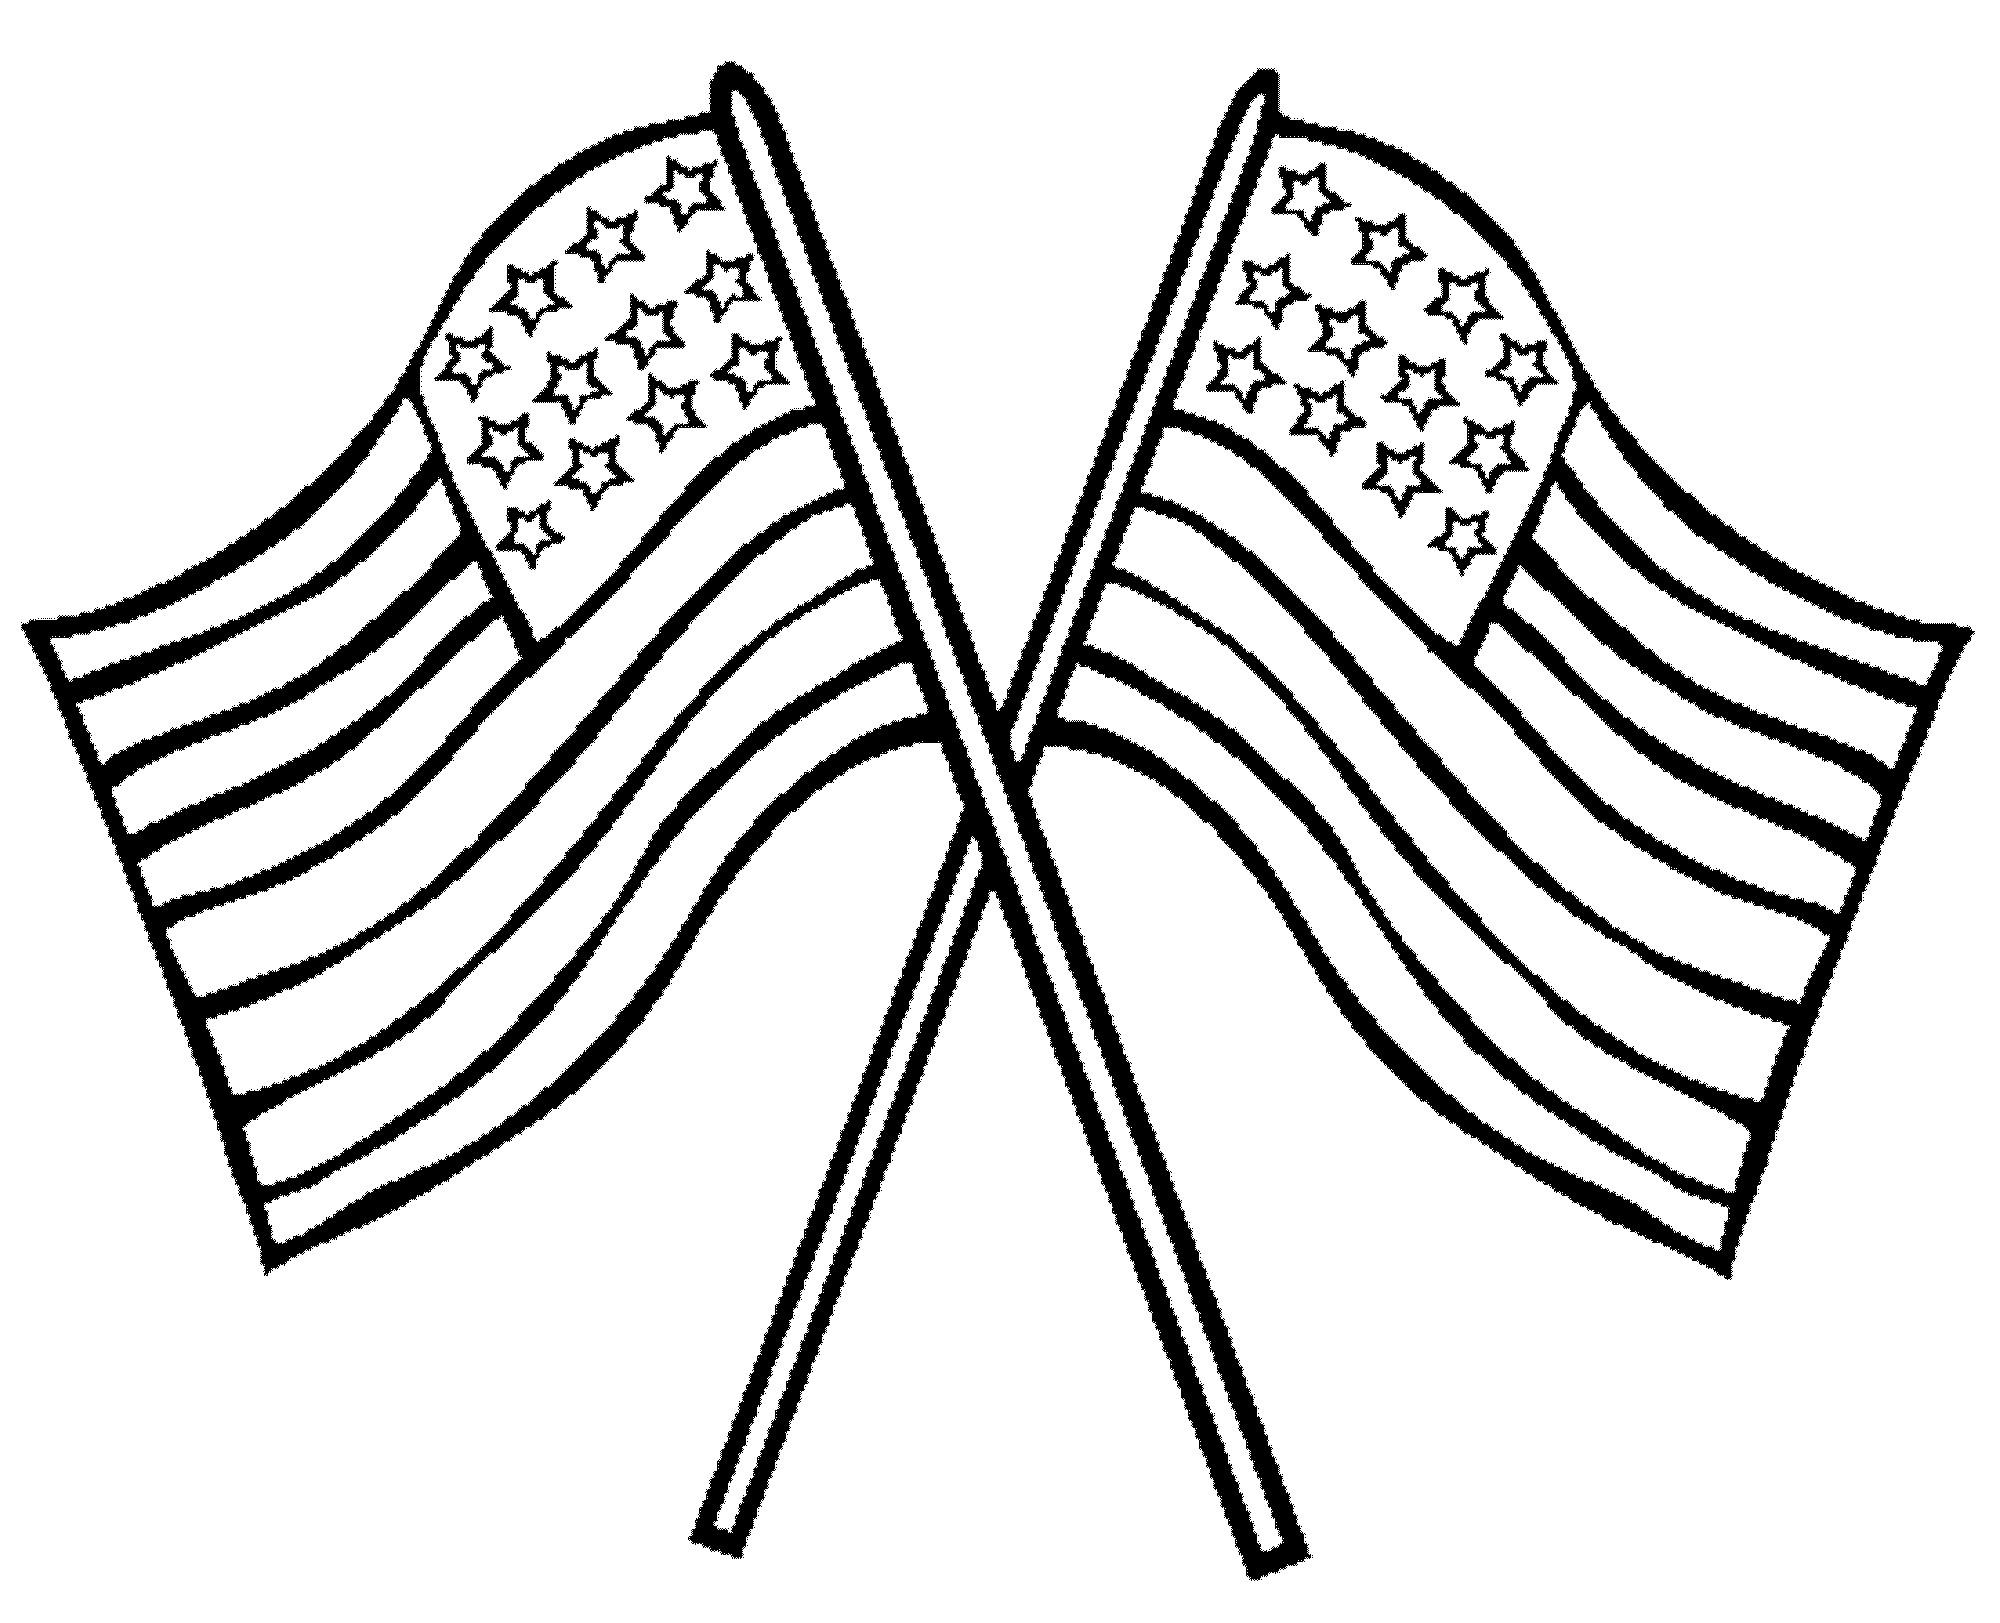 Usa Flag Drawing at GetDrawings.com | Free for personal use Usa Flag ...